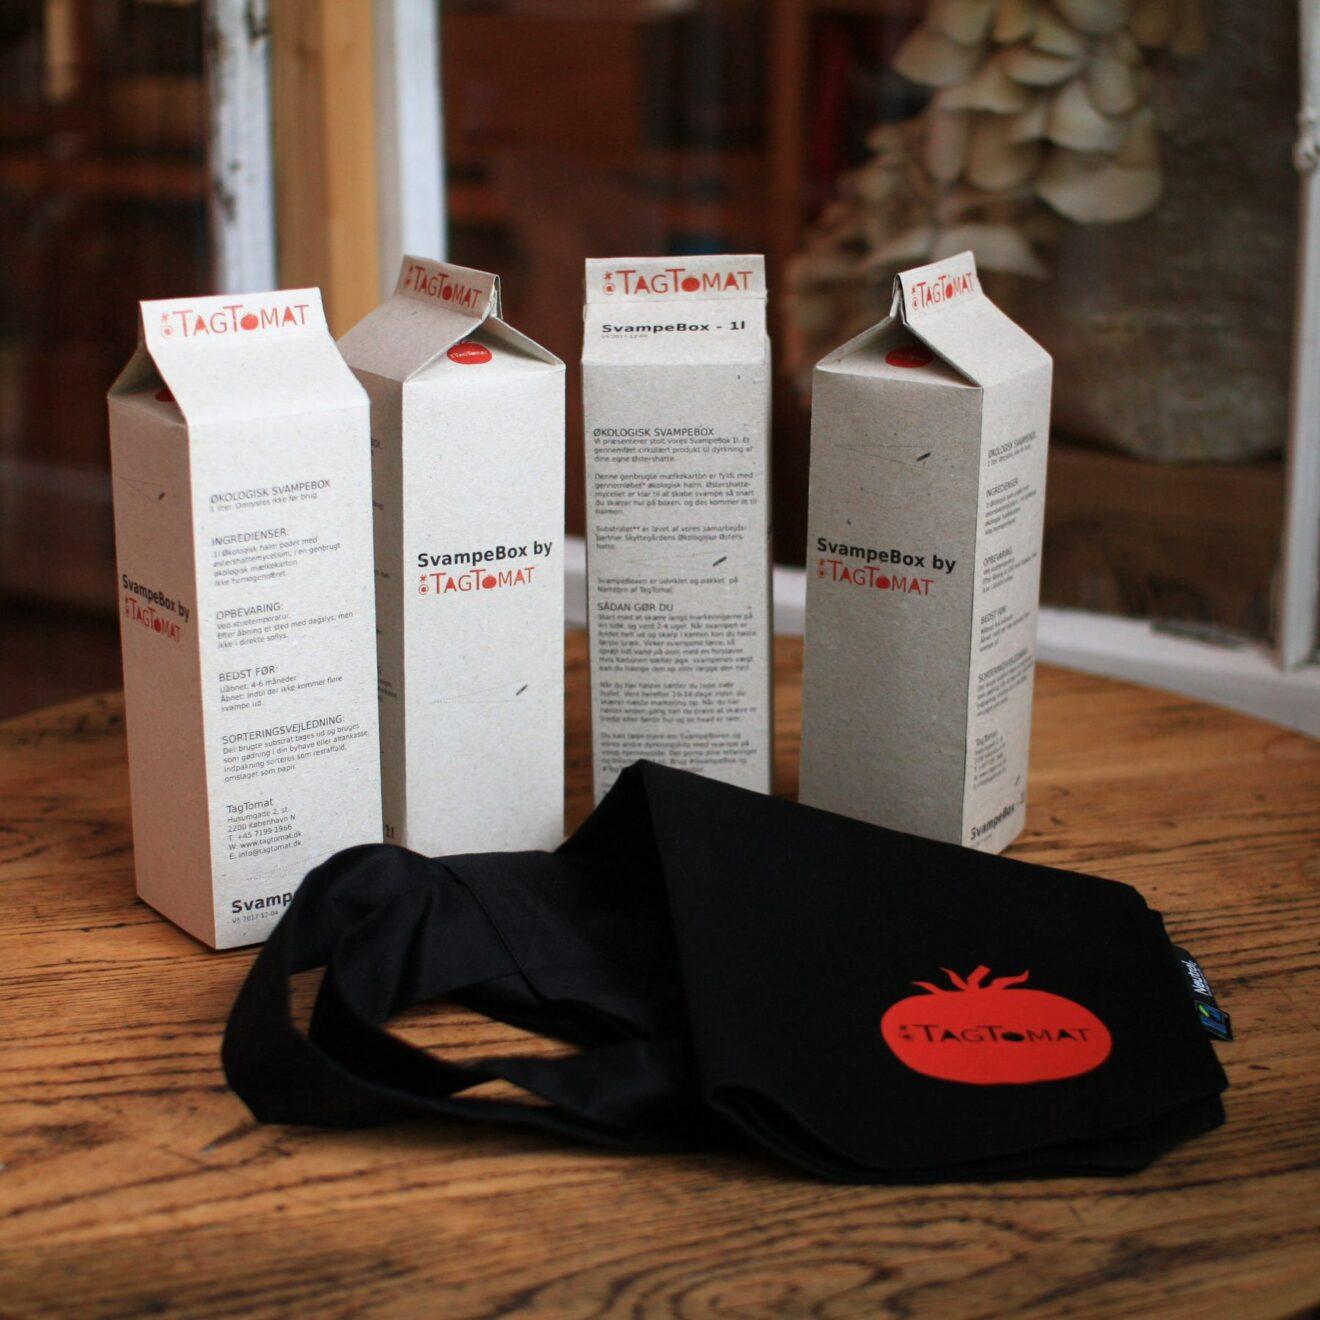 SvampeBox 1l - Gavesæt med 4stk dyrkningskit plus mulepose